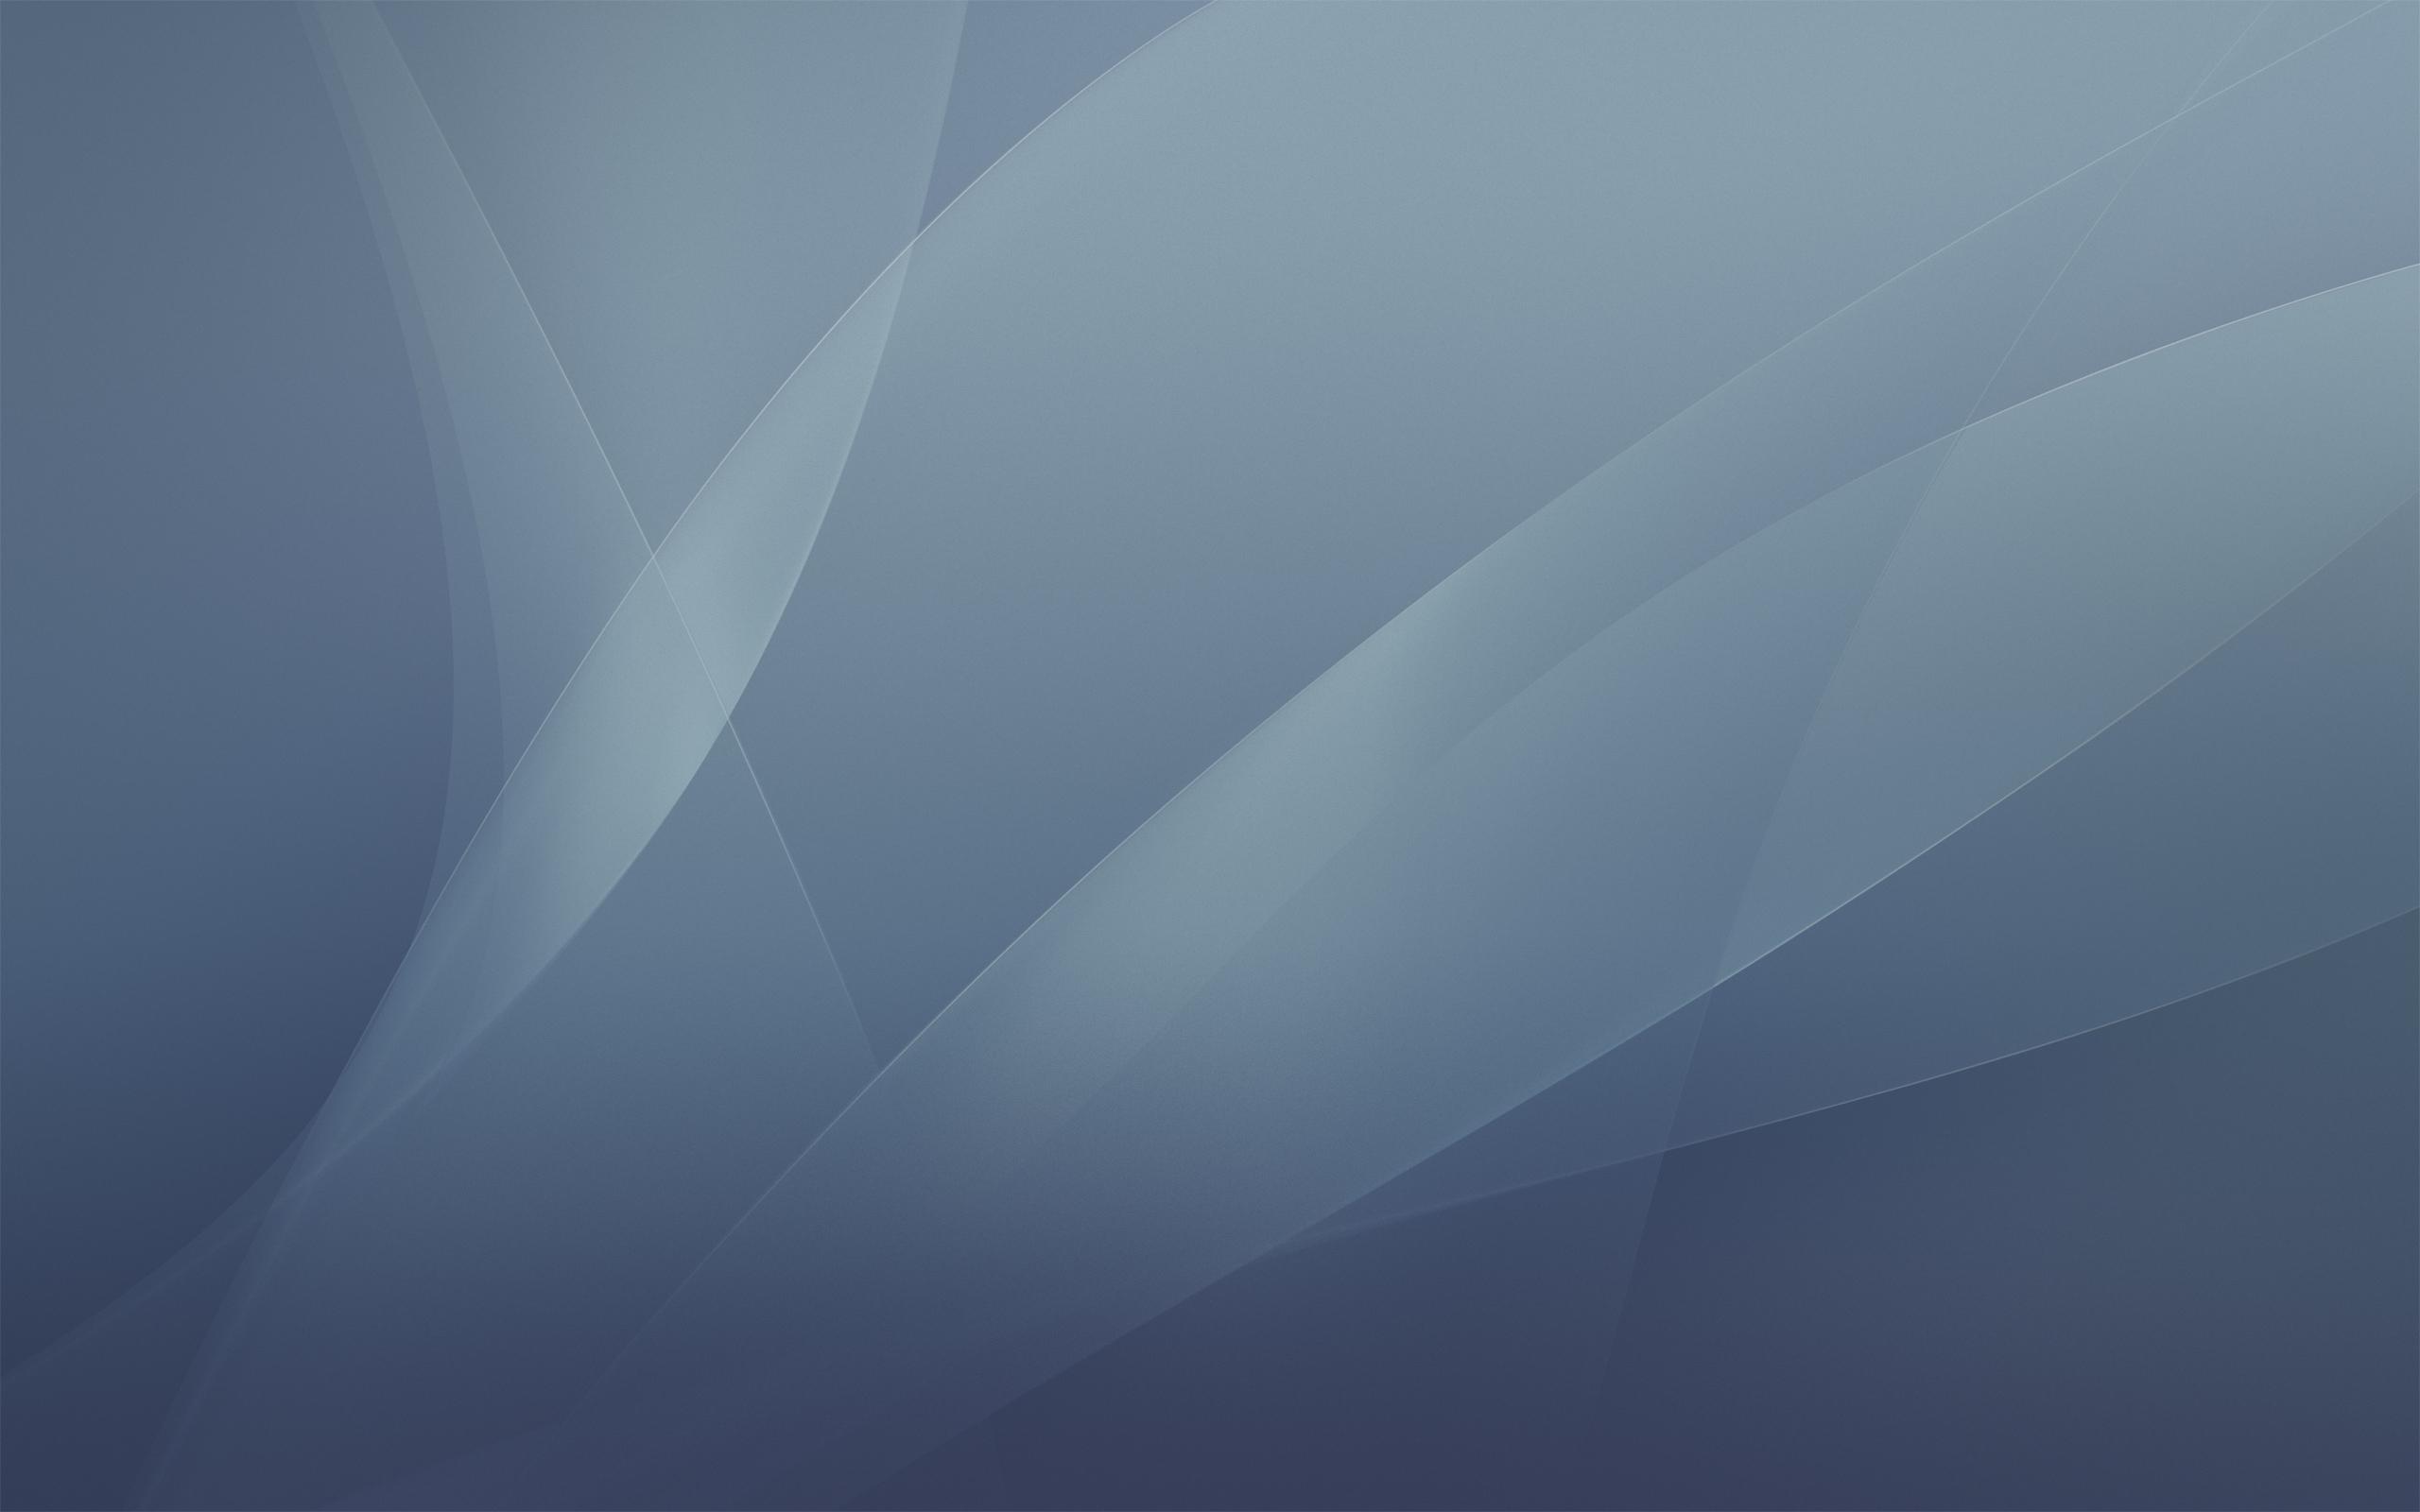 Grey Blue Wallpapers, Desktop 4K FHDQ Photos, Fungyung